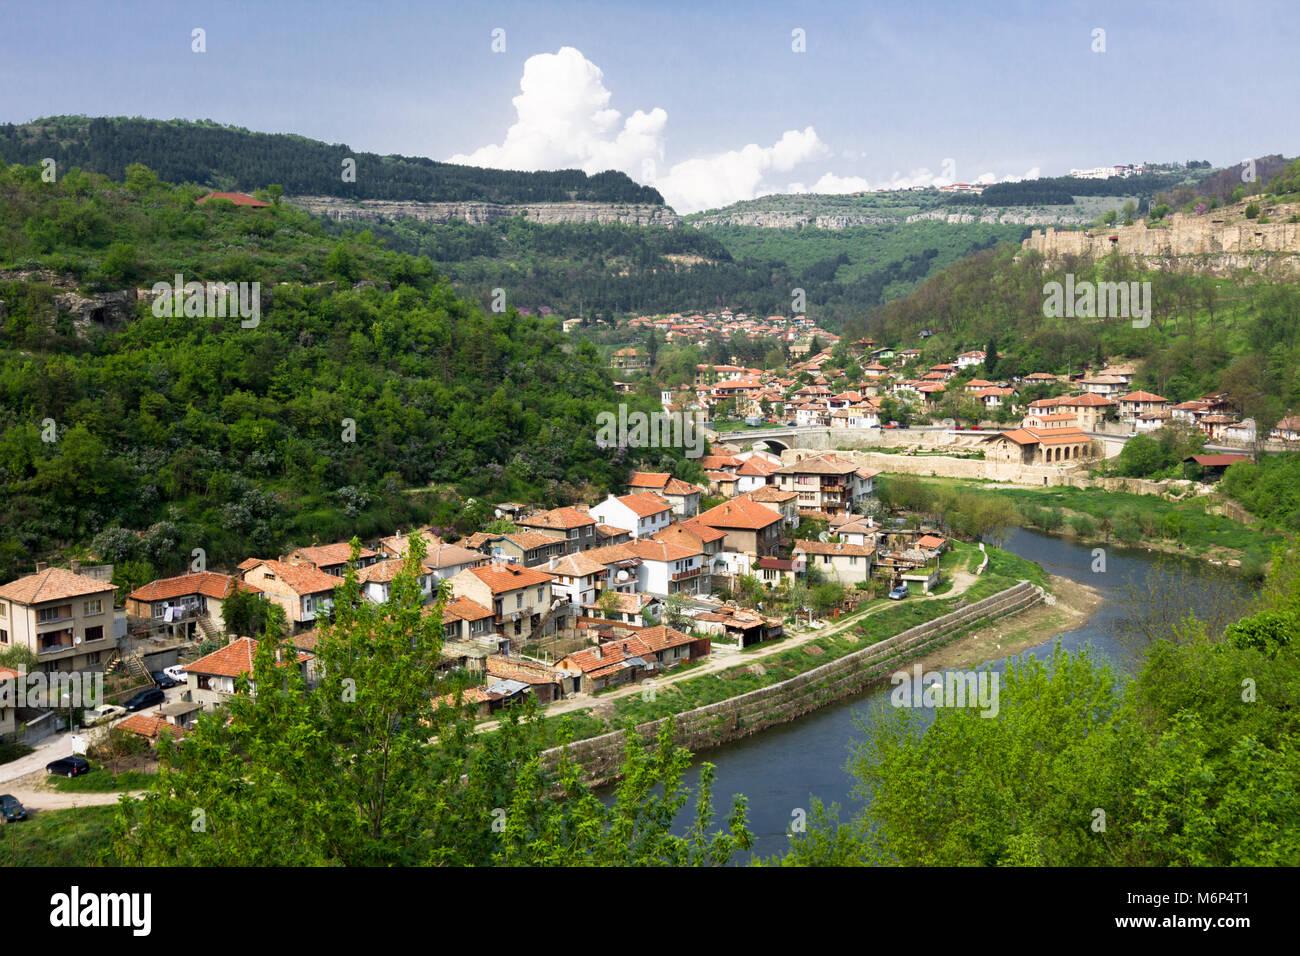 Overview of Veliko Tarnovo old town and Yantra river running through it. Veliko Tarnovo, Bulgaria Stock Photo